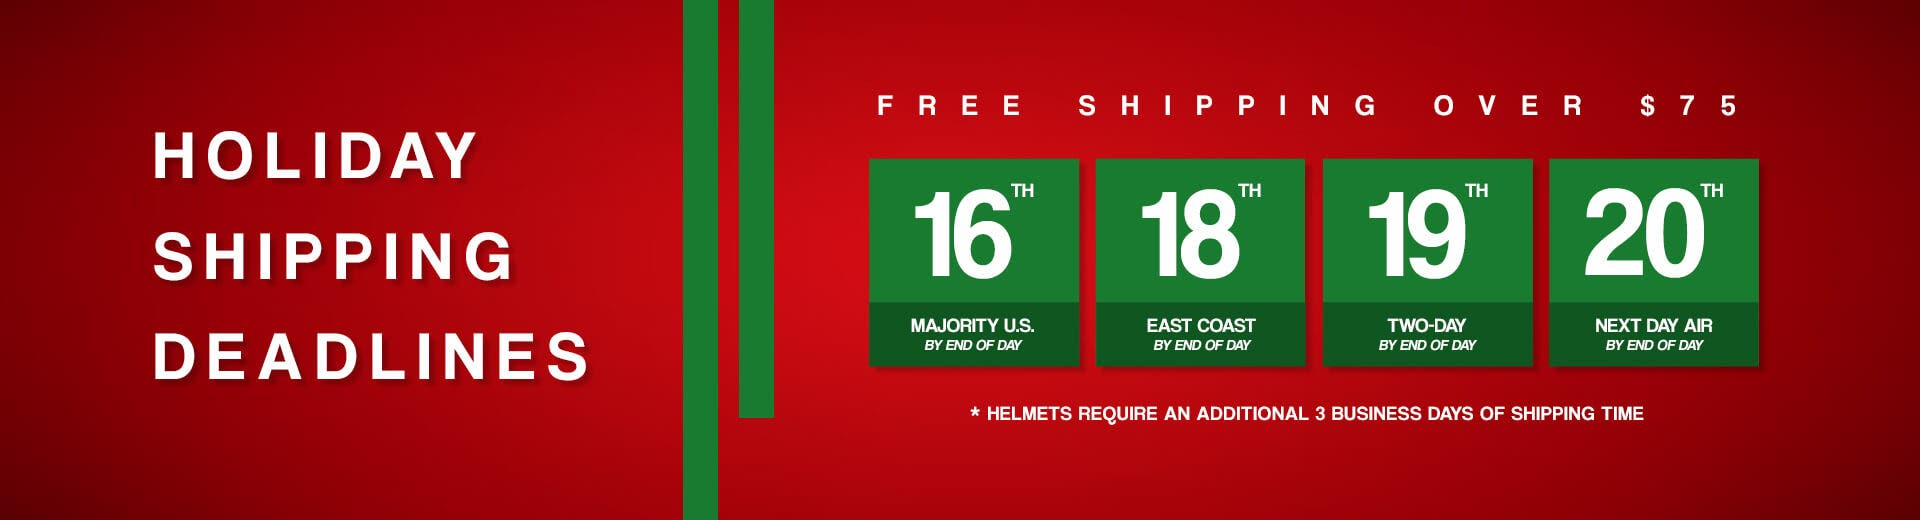 Holiday Shipping Deadline - DESKTOP